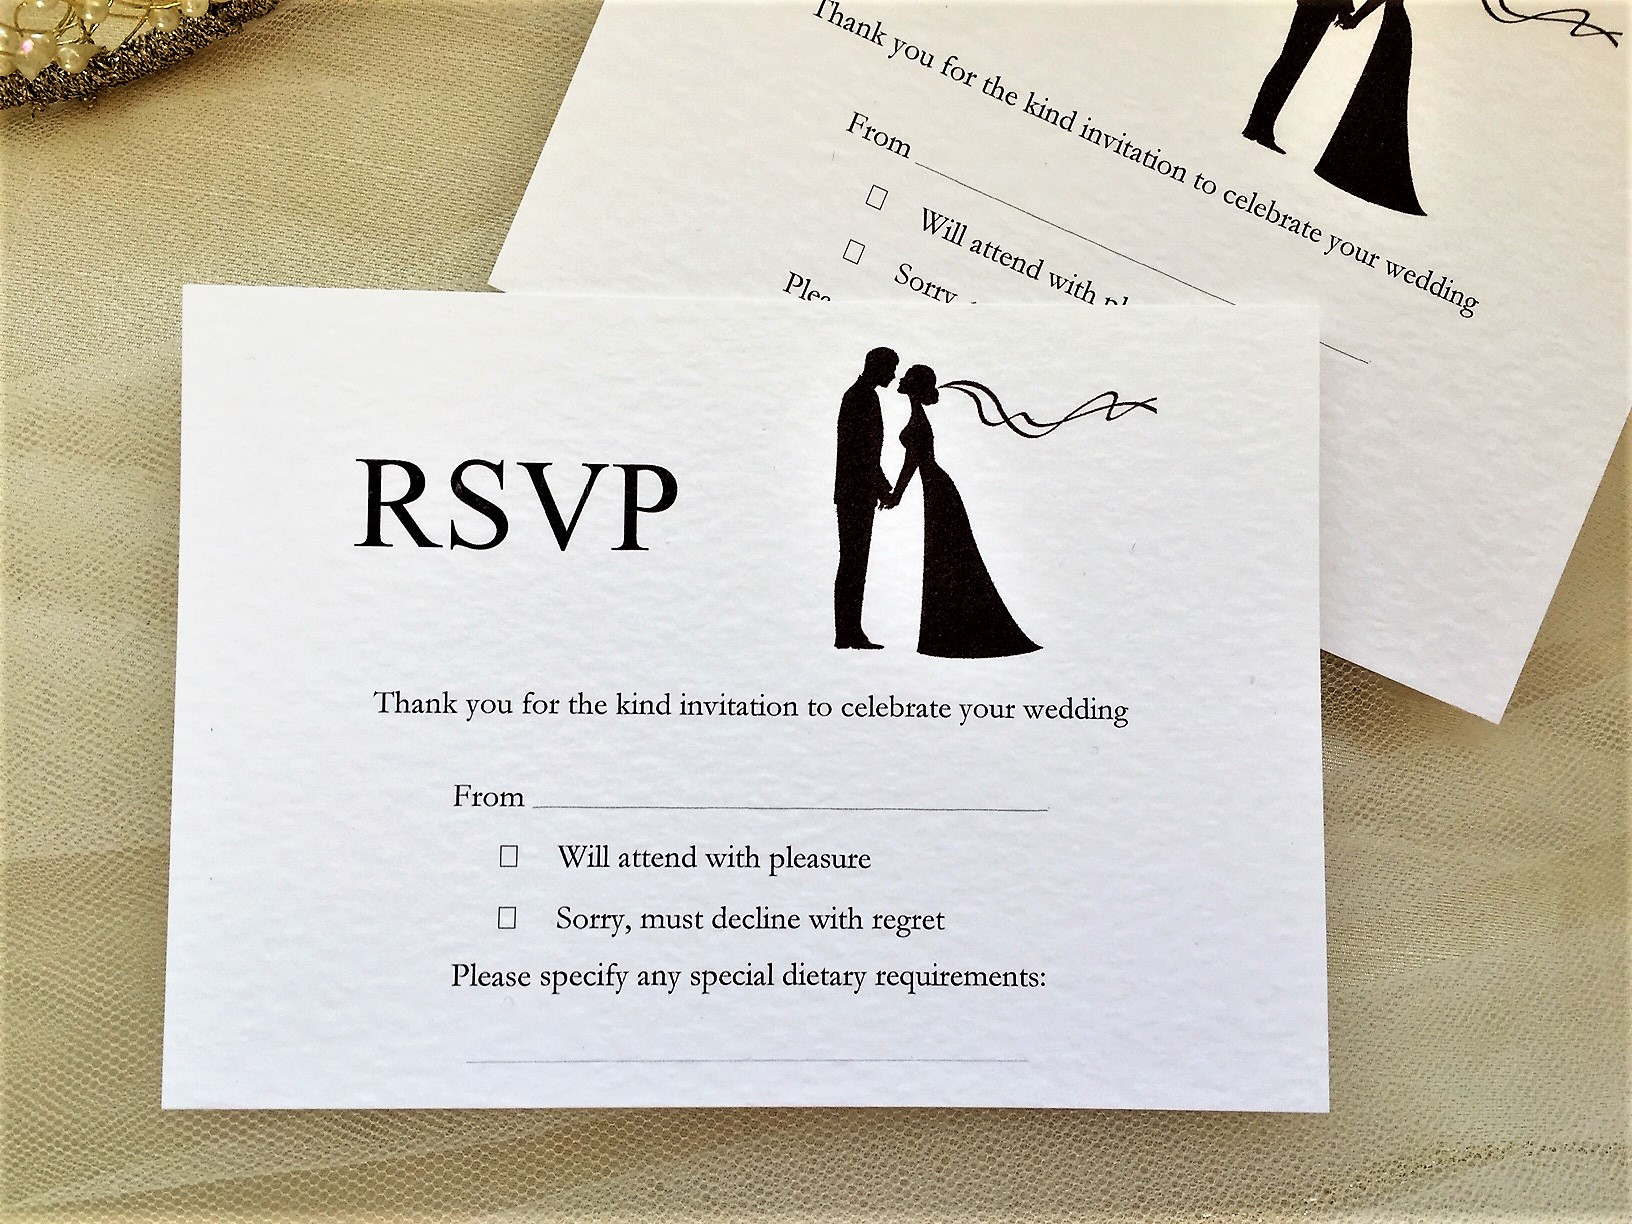 Finally RSVP Postcards 45p Each Affordable Modern Wedding Stationery